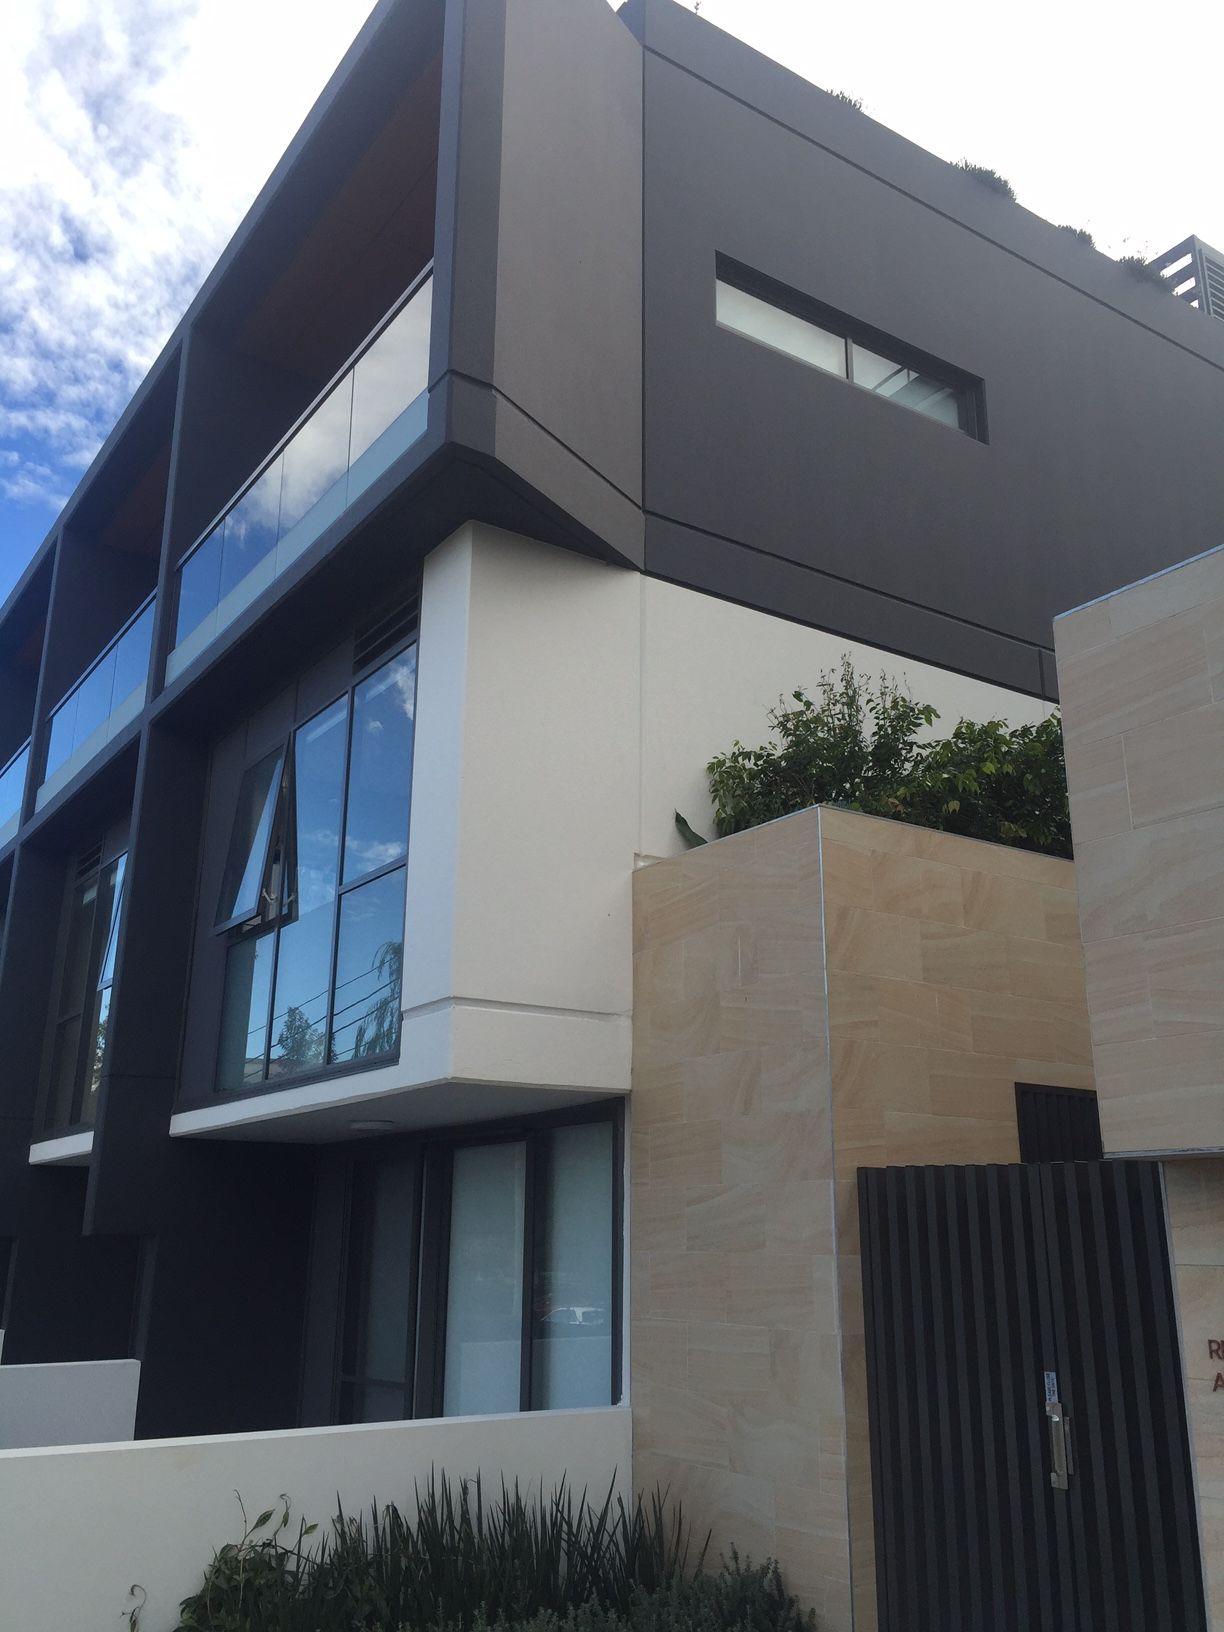 Apartment Building Color Schemes saw this apartment building in sydney. like the color scheme and